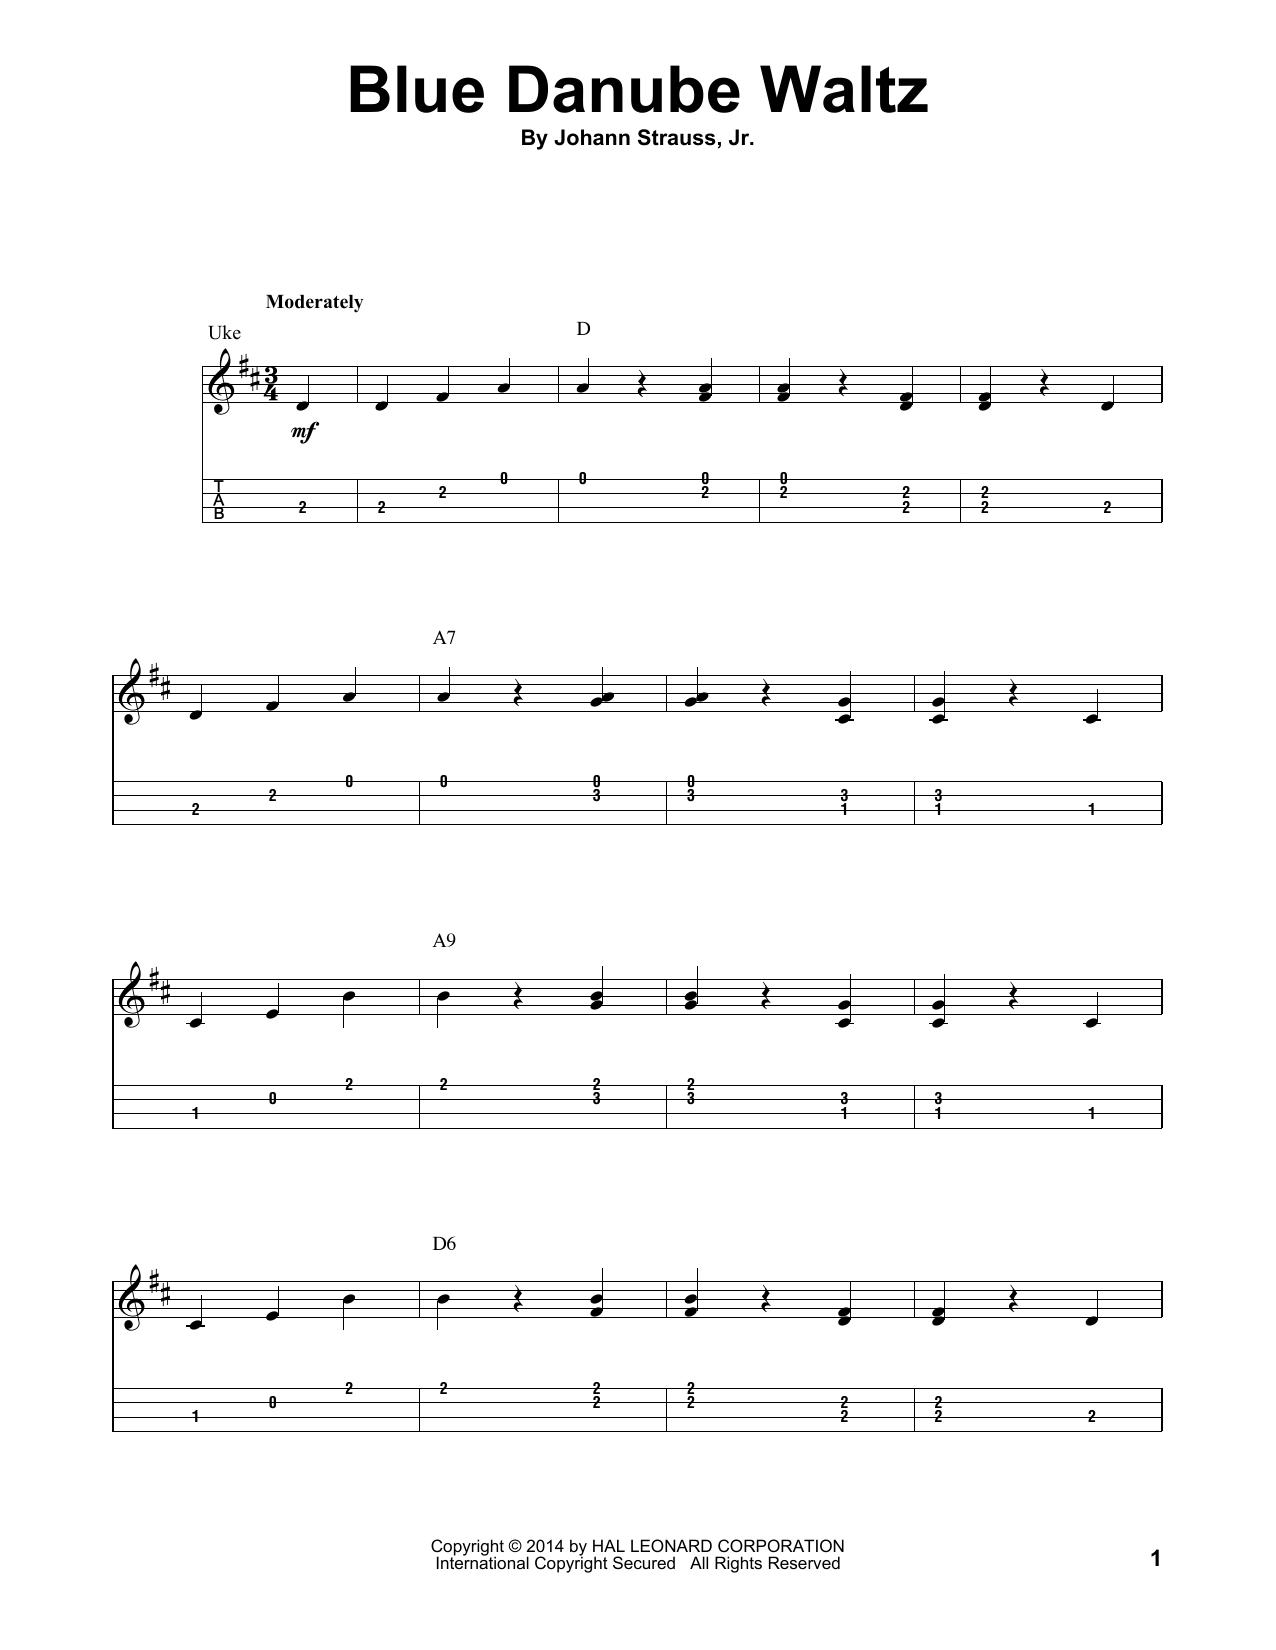 Johann Strauss, Jr. Blue Danube Waltz sheet music notes and chords. Download Printable PDF.